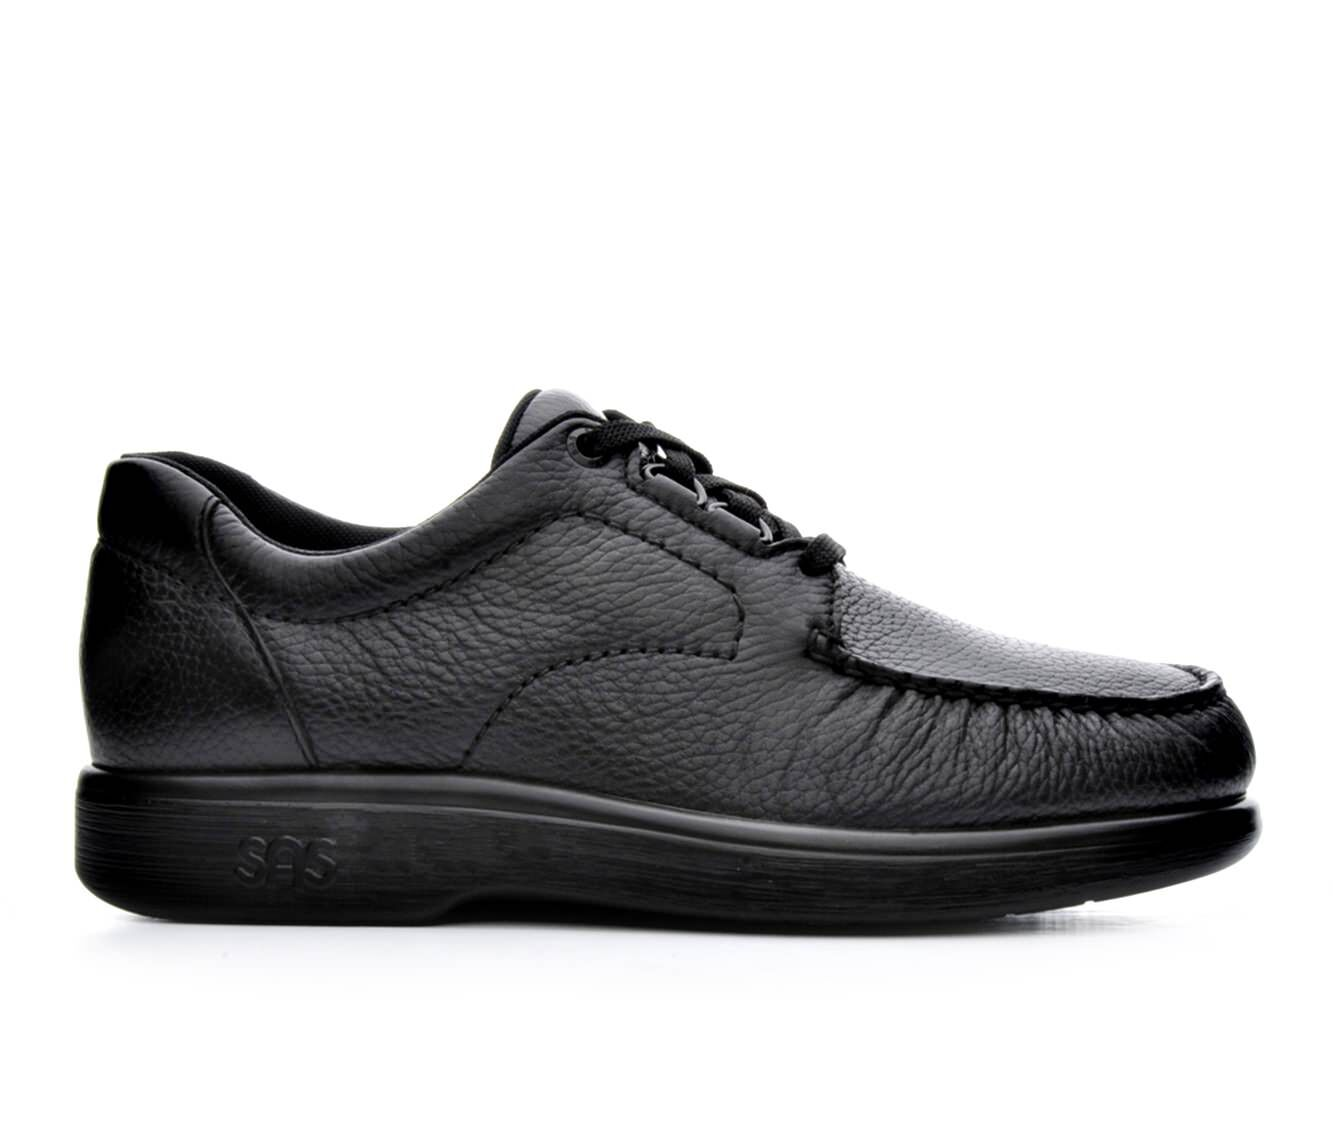 uk shoes_kd1046